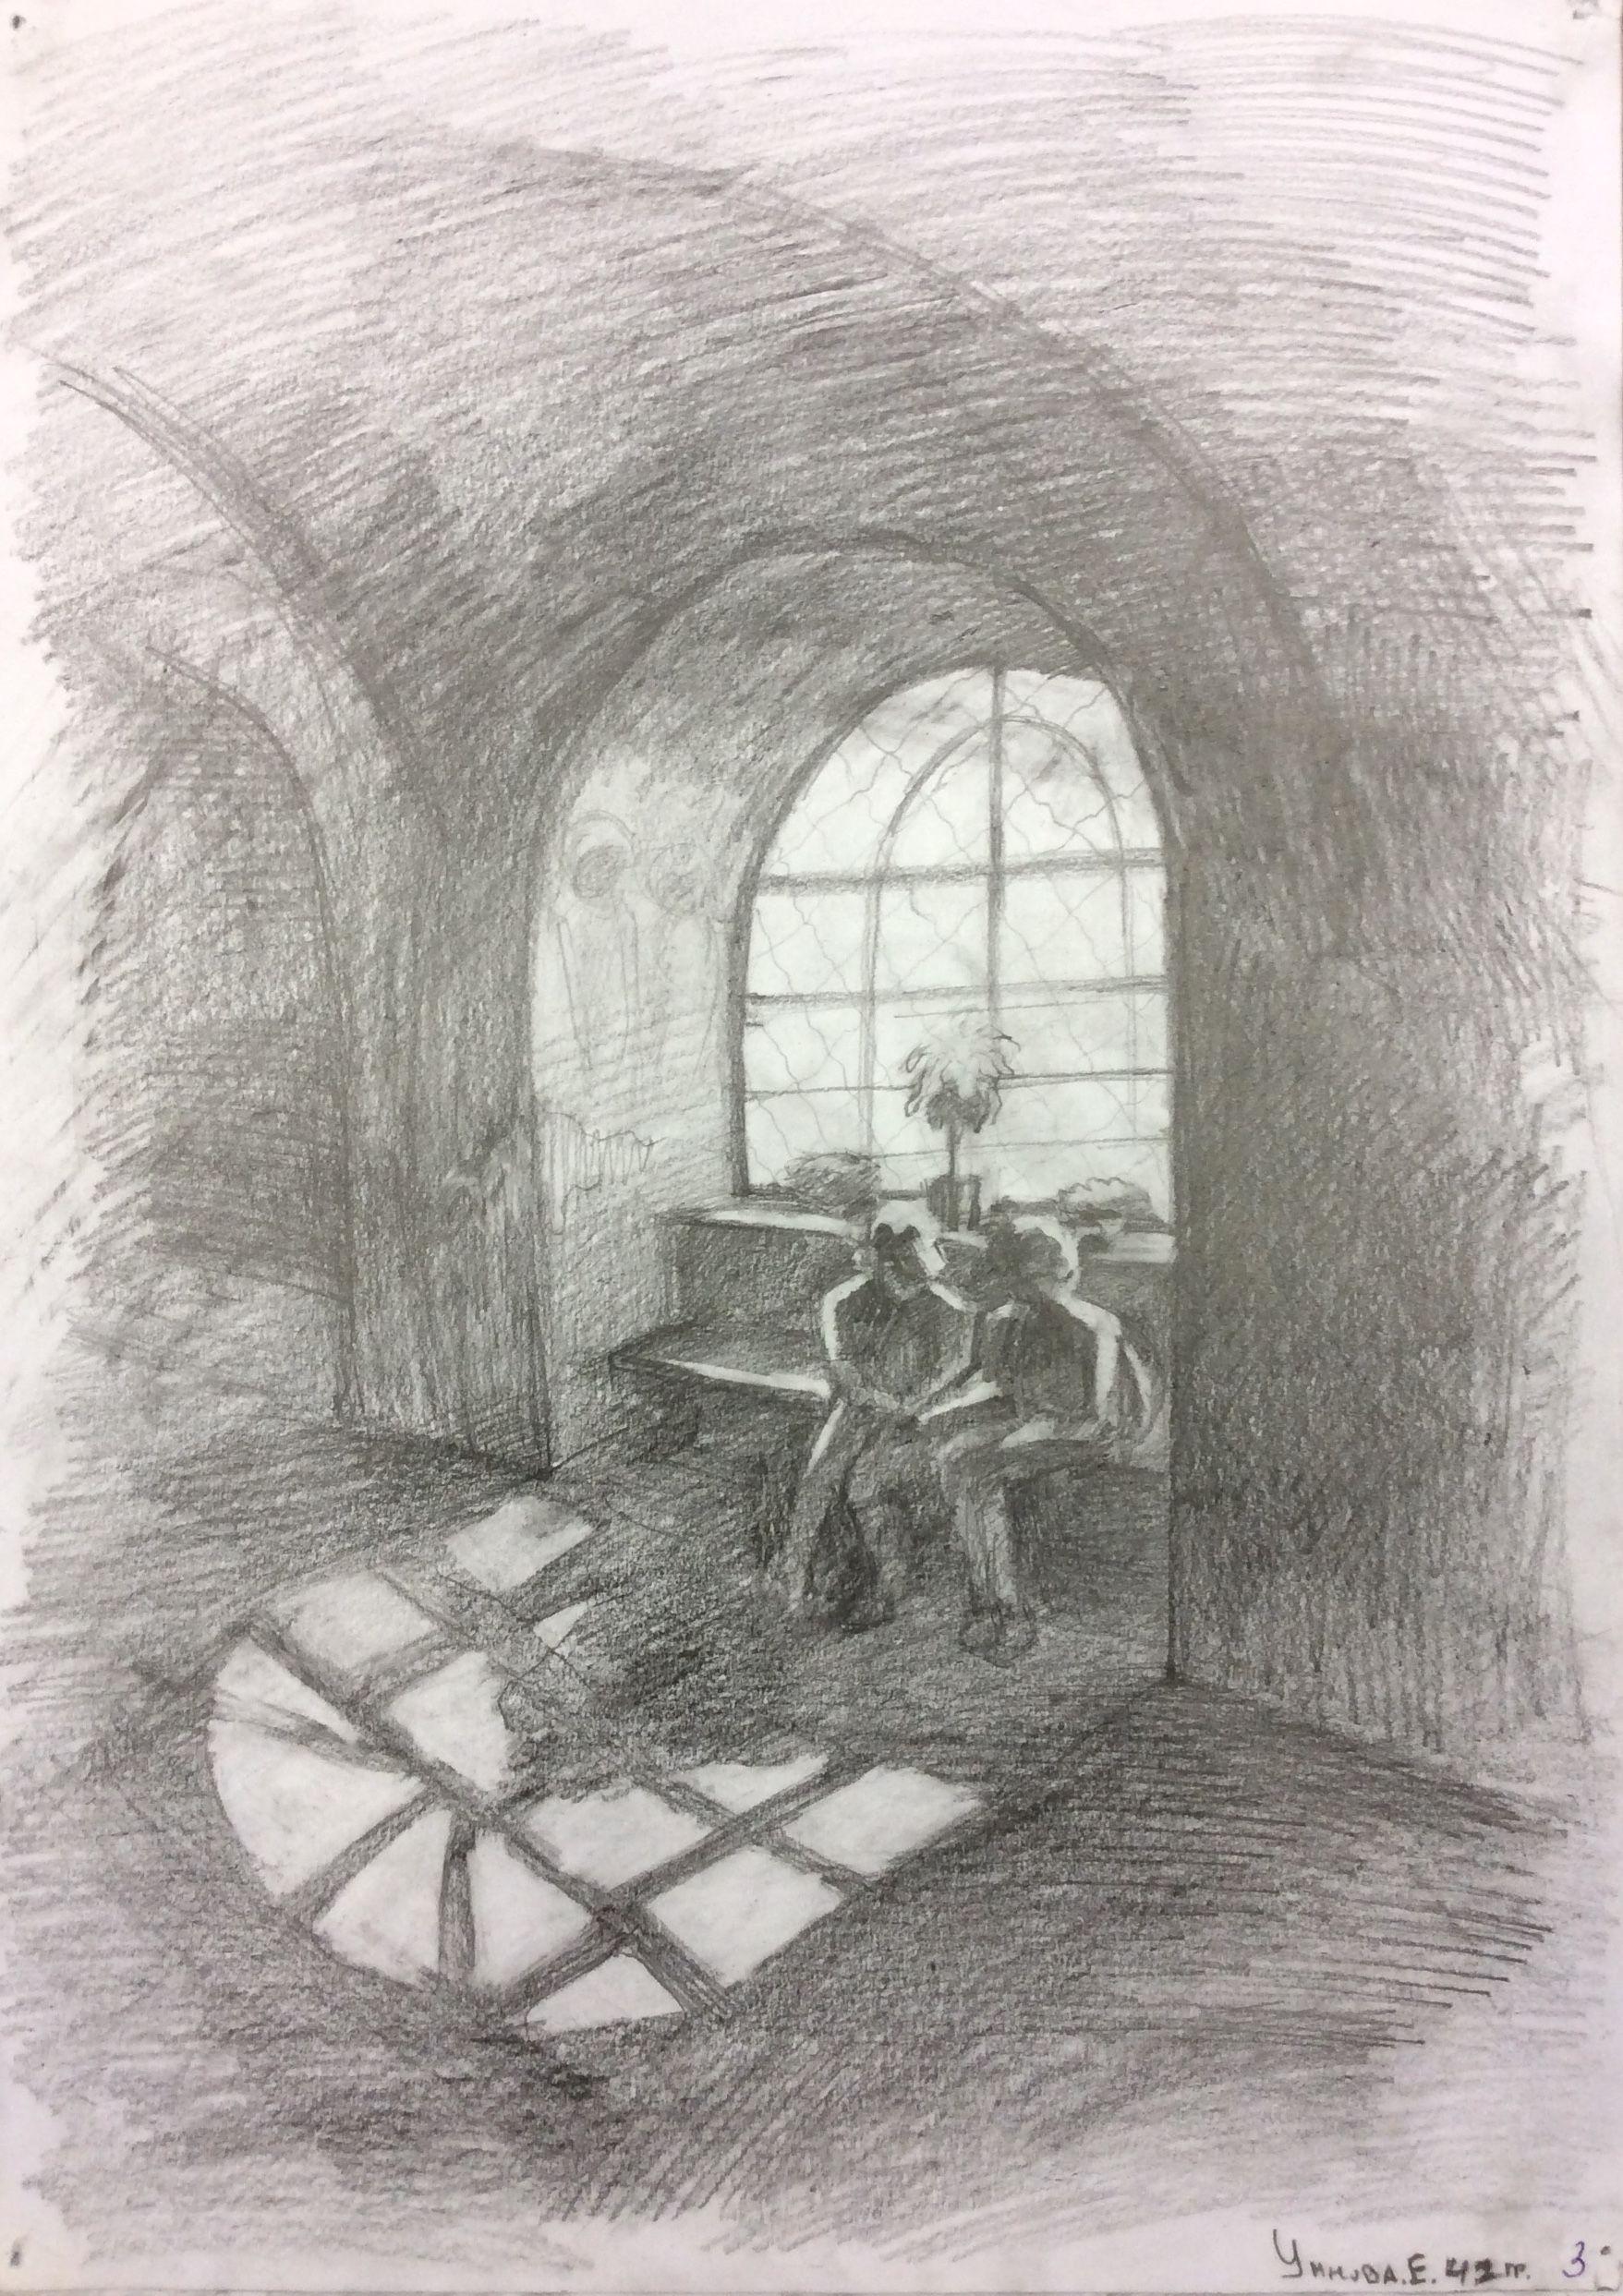 «Тихвин. Собор. После экскурсии», Умнова Екатерина (13 лет), карандаш, преп. С. А. Латыпова